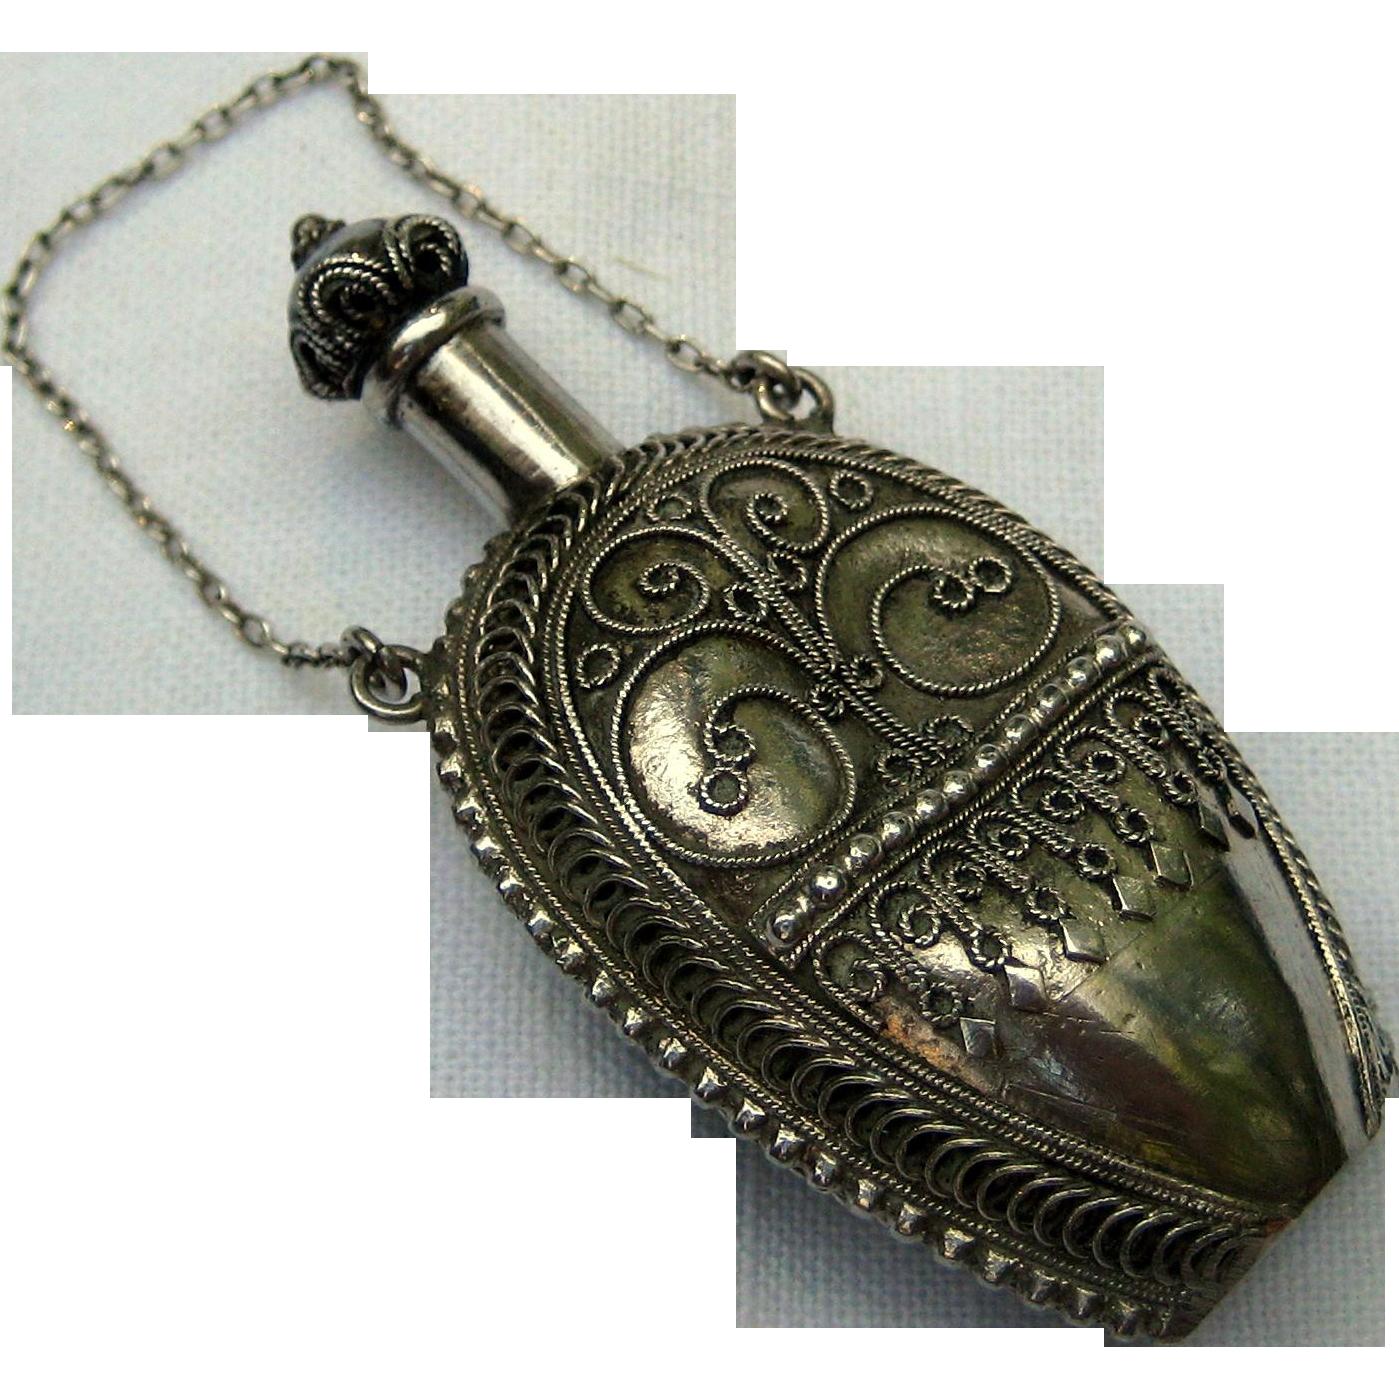 Bezalel 900 Silver Perfume Flask - Made in Palestine Circa 1910 - 1915